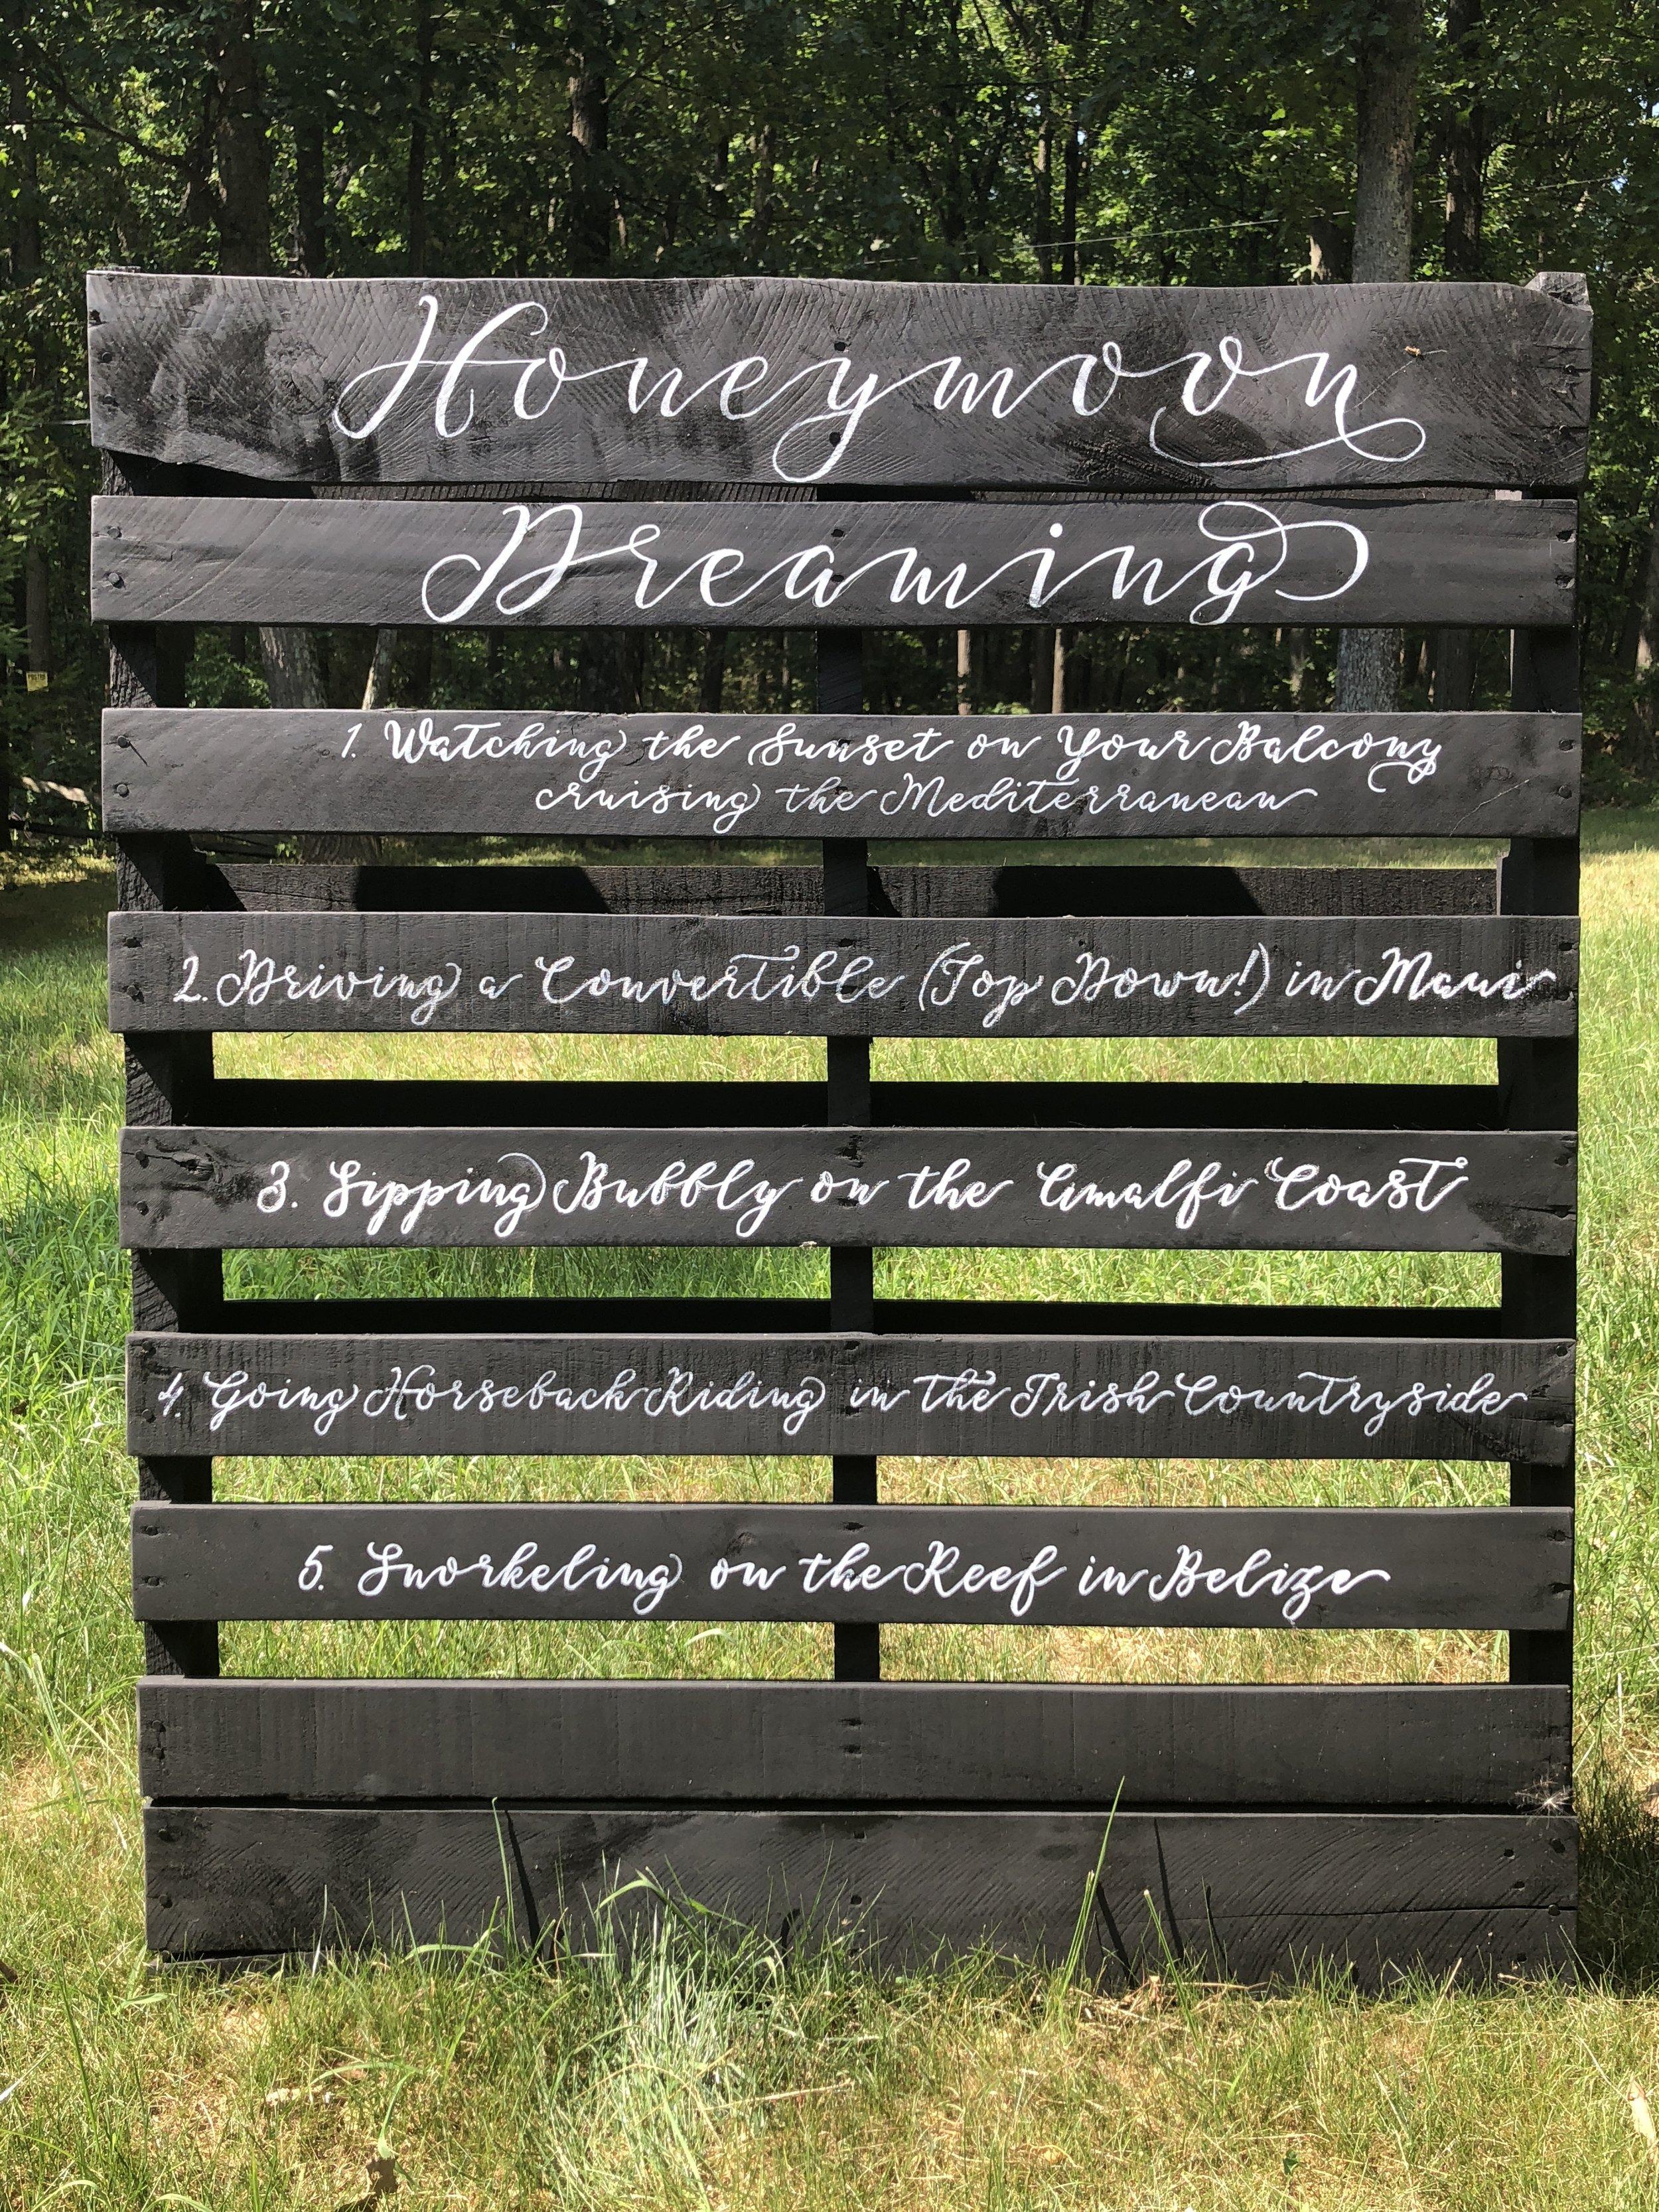 Central PA, York PA, JesSmith Designs, custom, wedding, invitations, bridal, Harrisburg, hanover, calligraphy, baltimore, wedding invitations, lancaster, gettysburg, 07-16 15.49.20.jpg